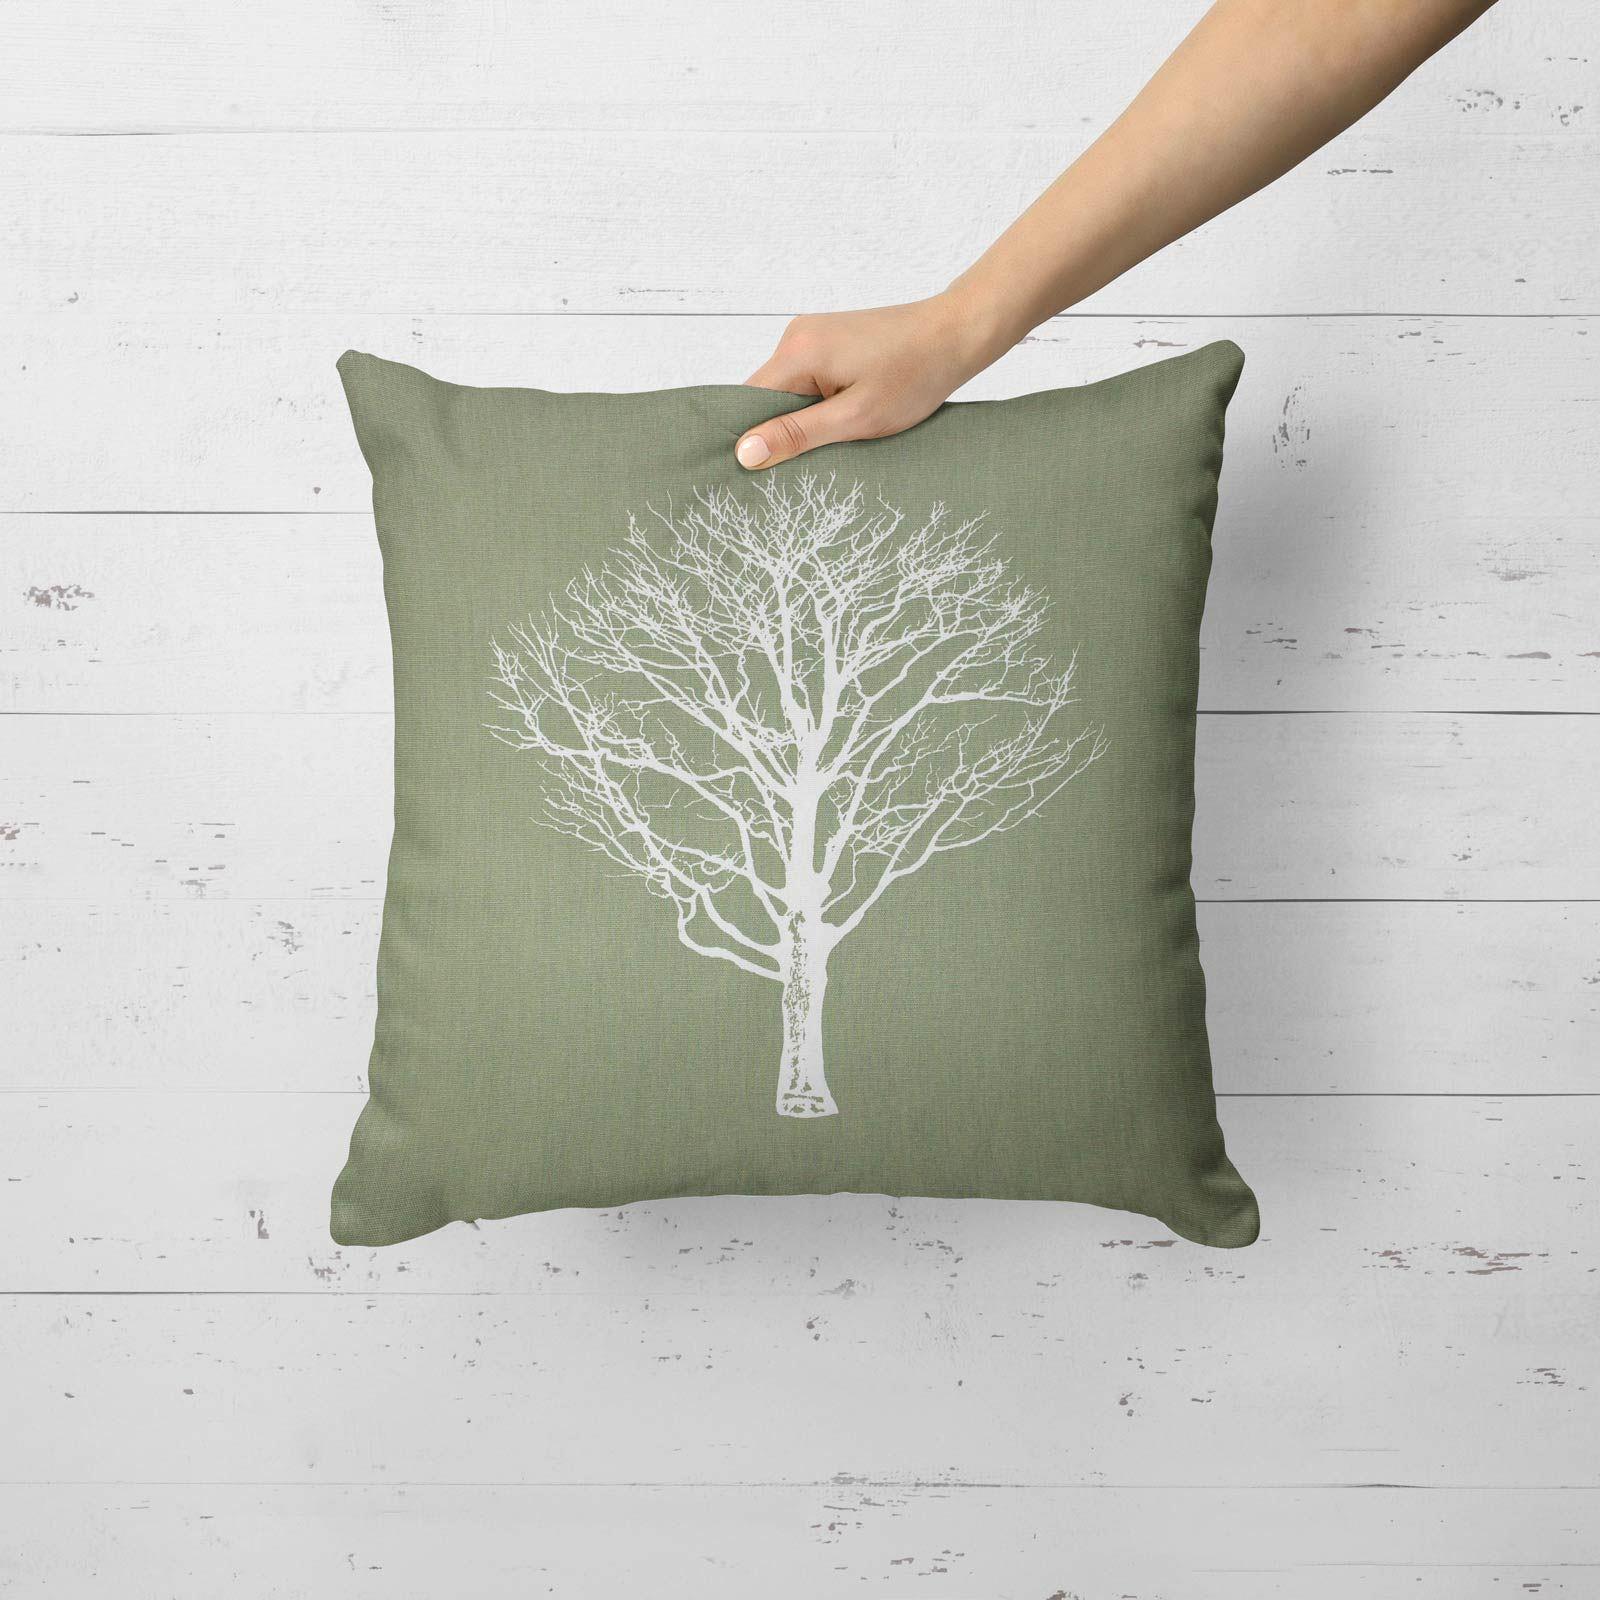 Woodland-Trees-Cushion-Cover-Modern-Reversible-Tree-Print-Covers-17-034-x-17-034 thumbnail 28